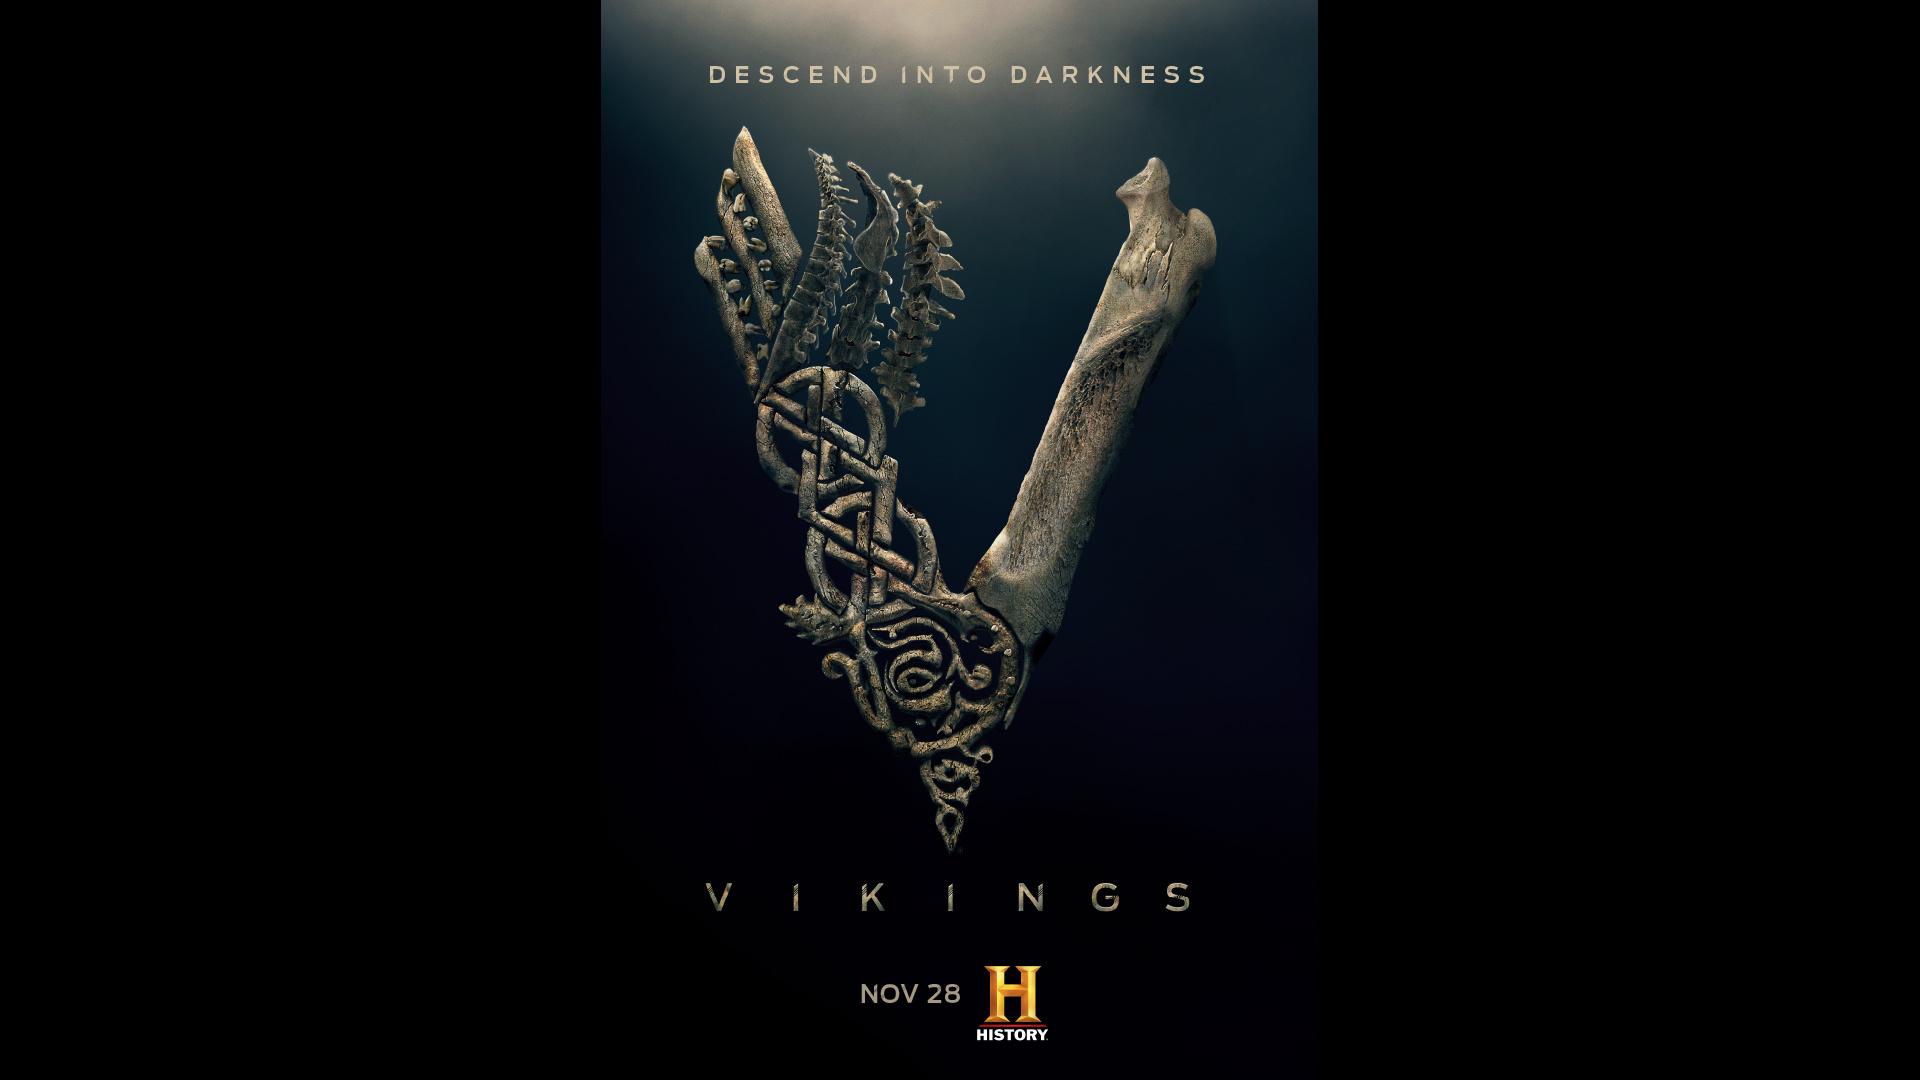 Thumbnail for Vikings: Tease Poster